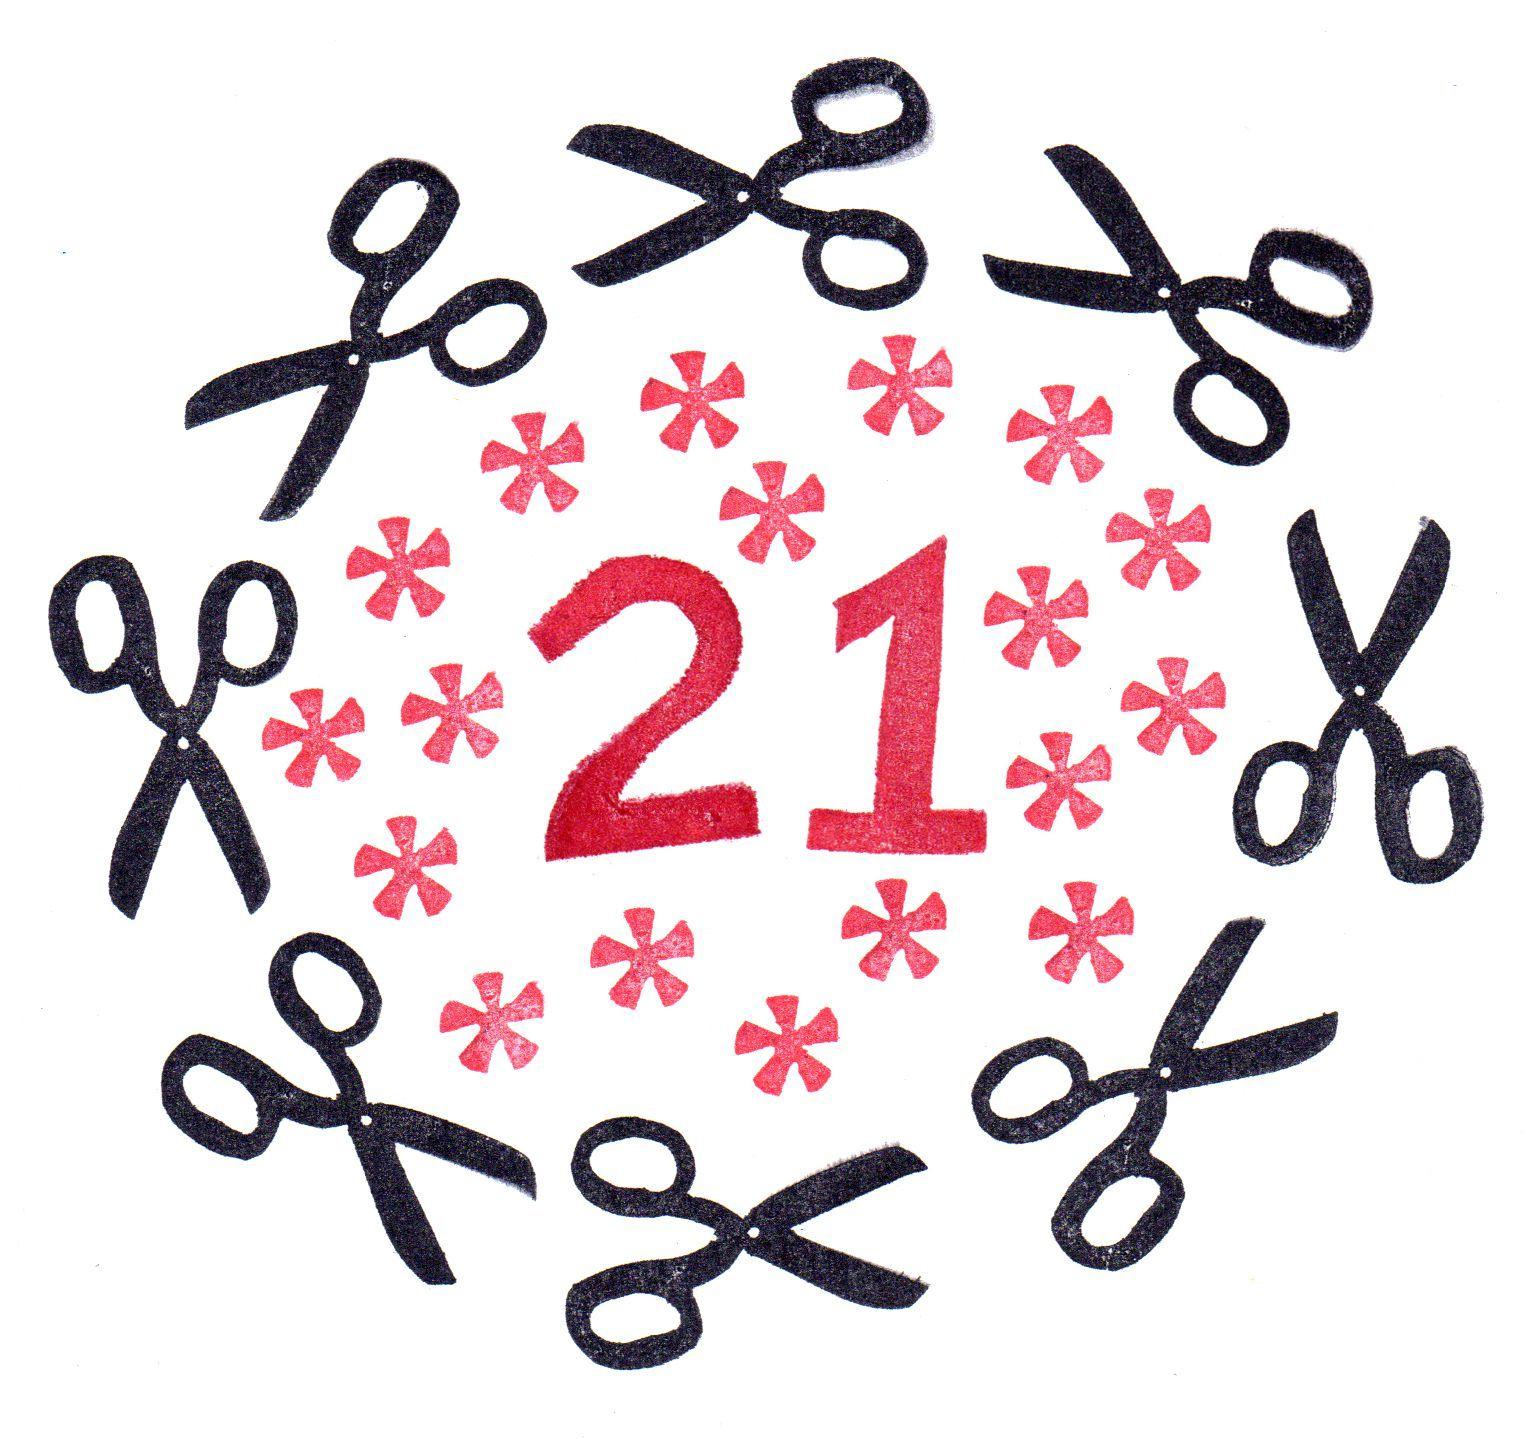 21 Jaar Verjaardag Tekst Verjaardagskaarten Pinterest